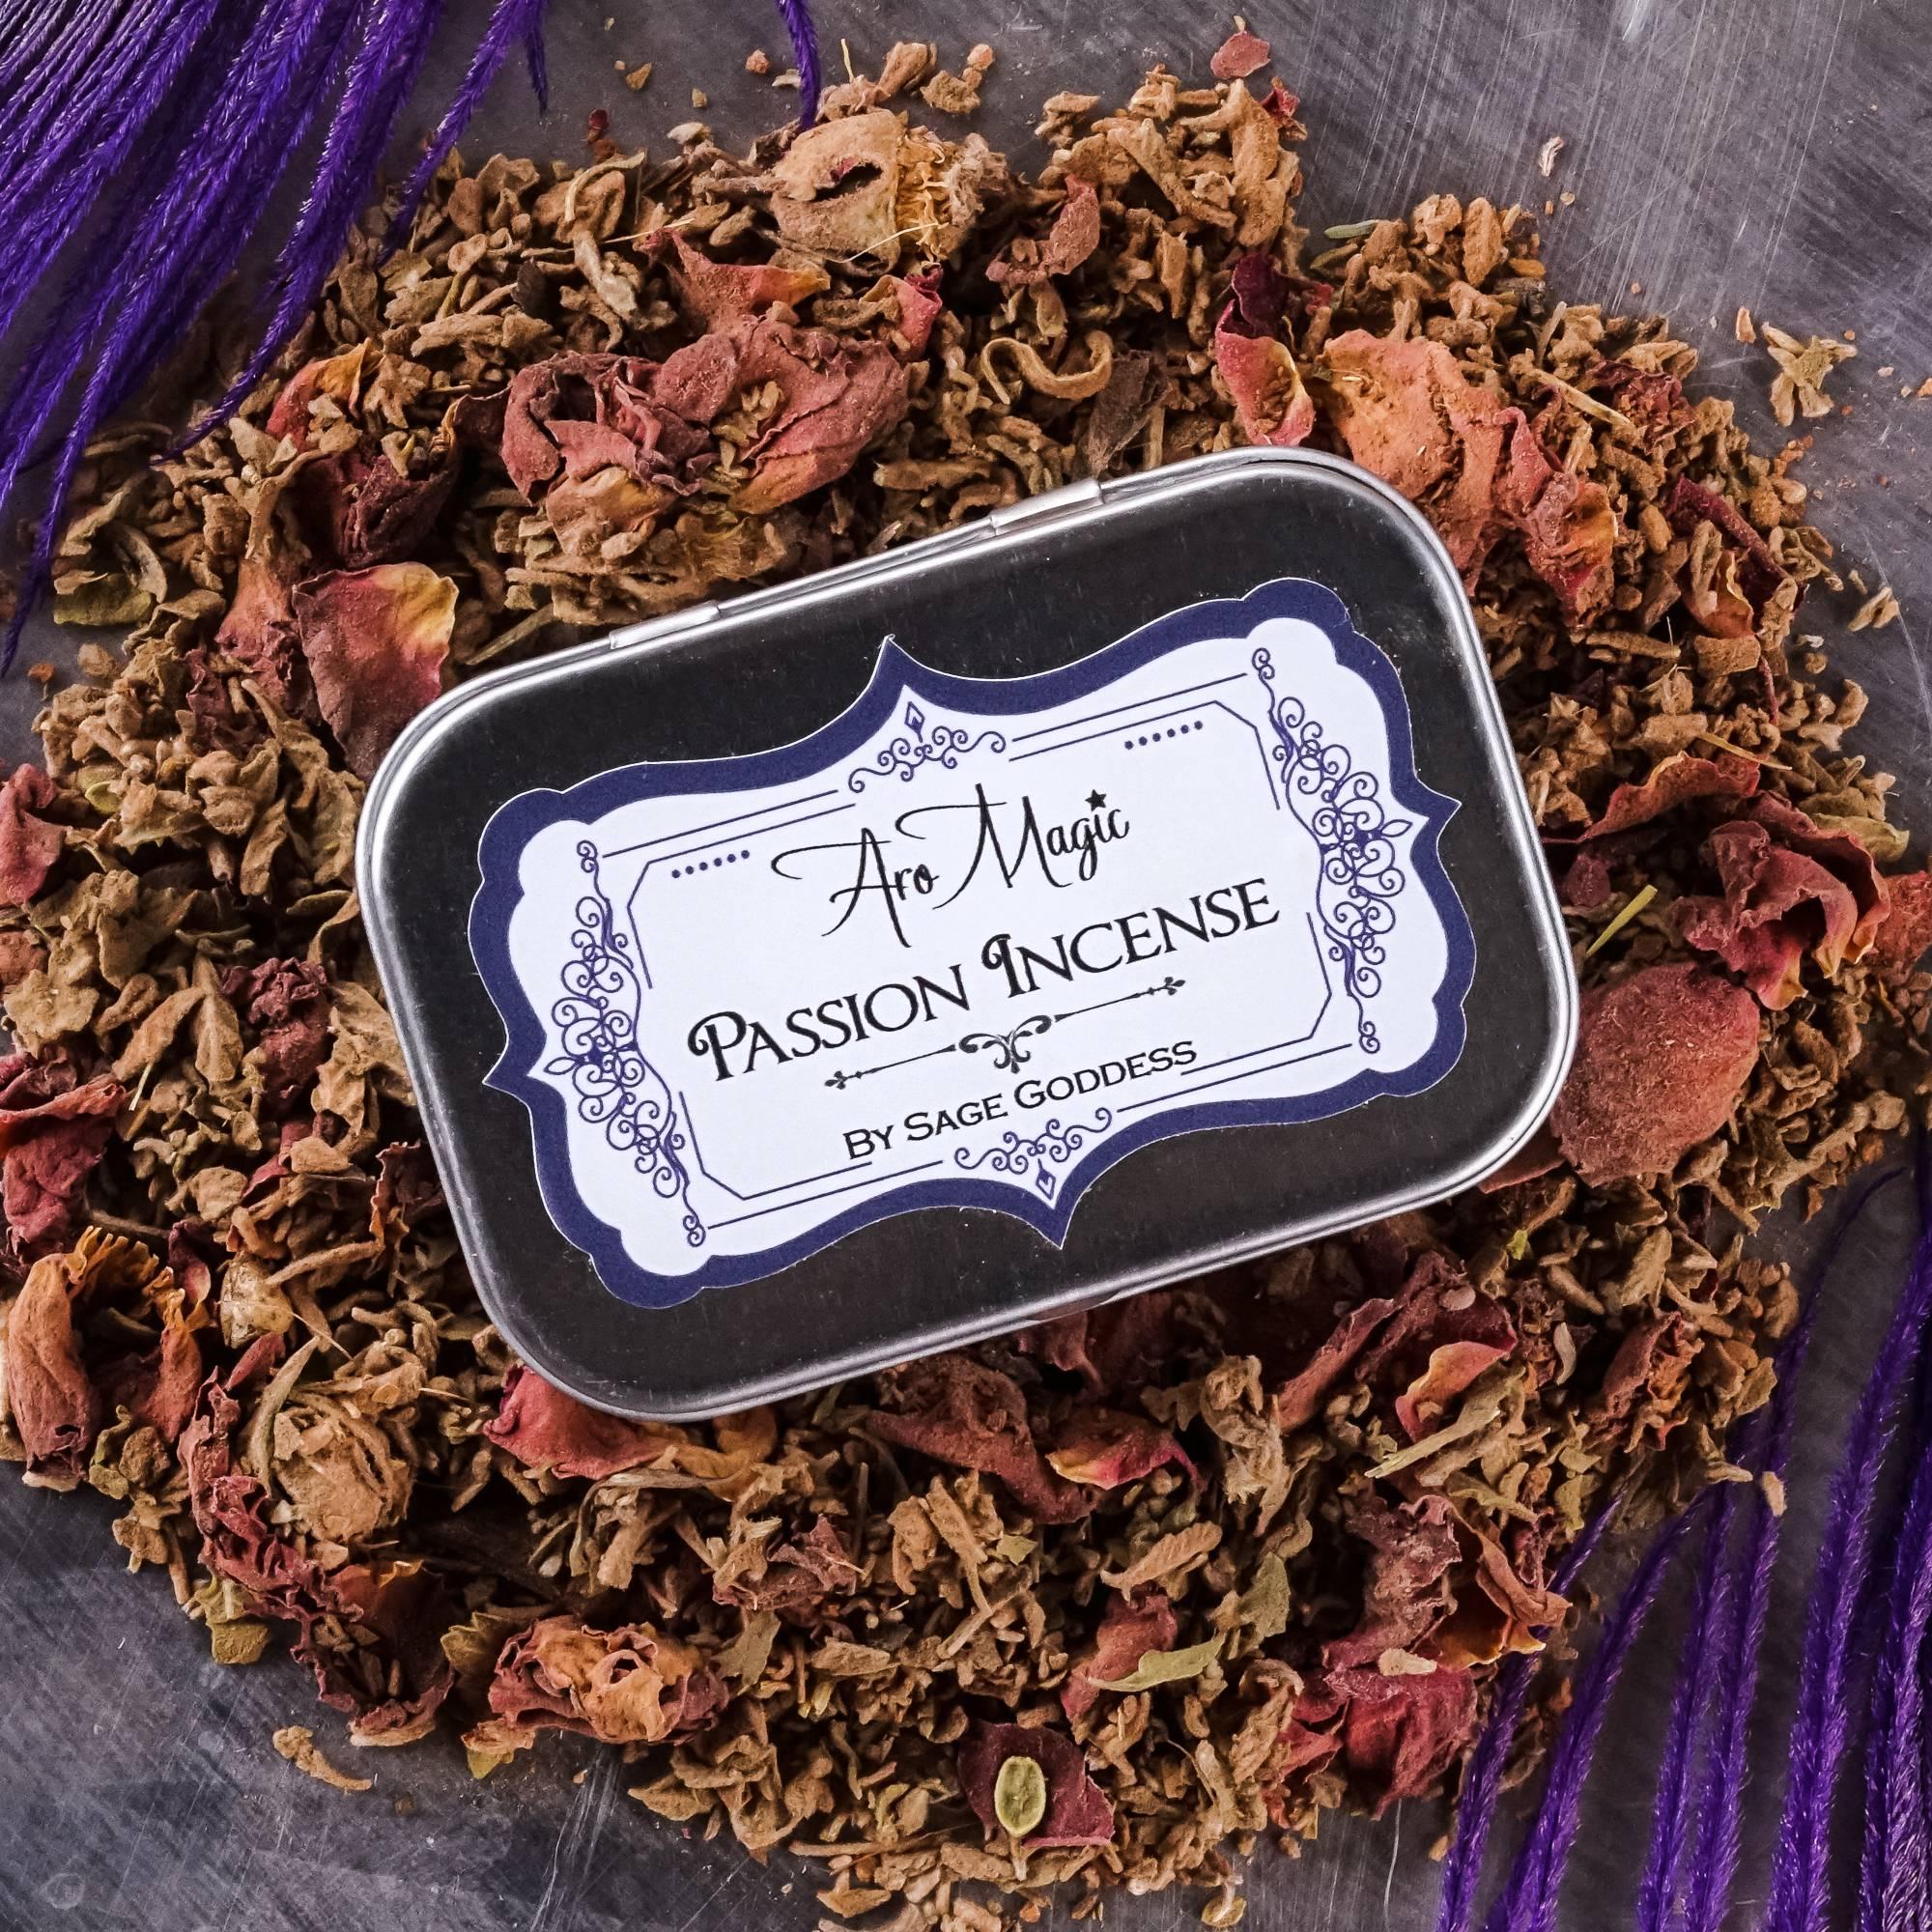 passion incense